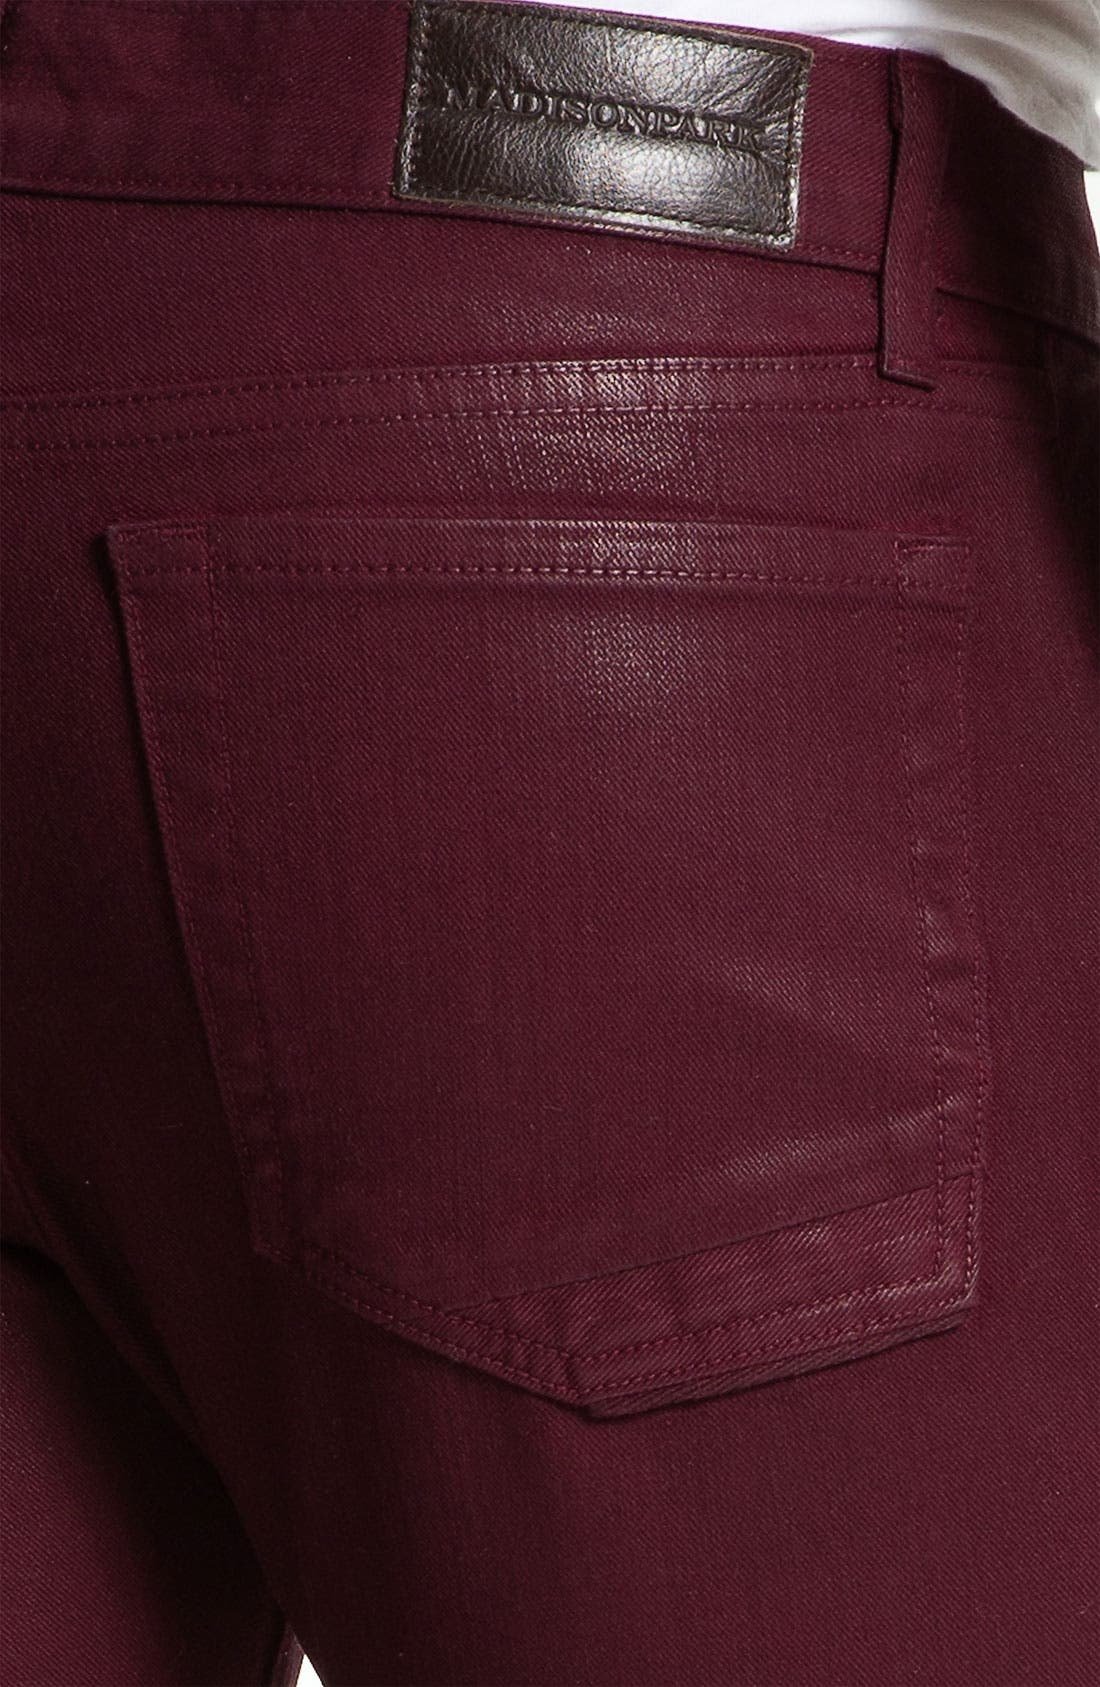 Alternate Image 3  - Madisonpark Collective 'Miles' Slim Straight Leg Jeans (Merlot)